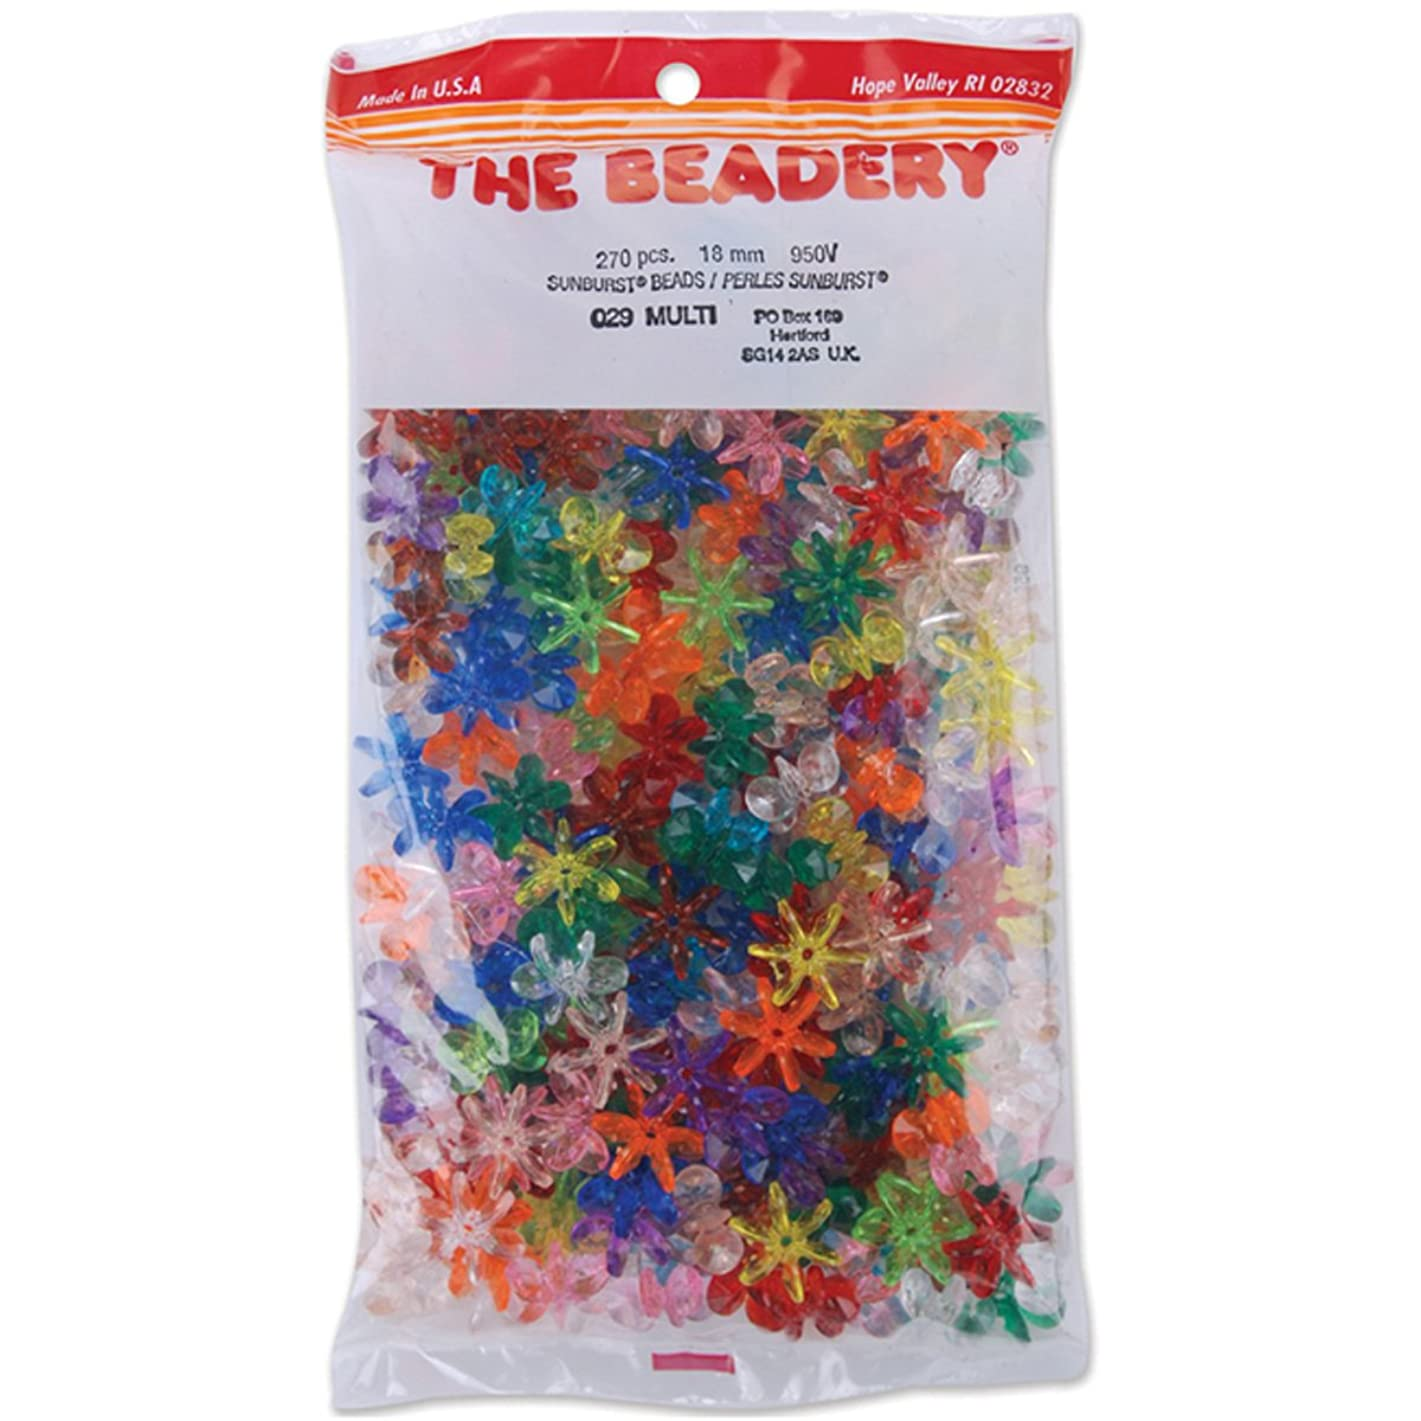 The Beadery 18mm Sunburst Beads, Multi, 270-Piece Per Bag bzmcux221558585